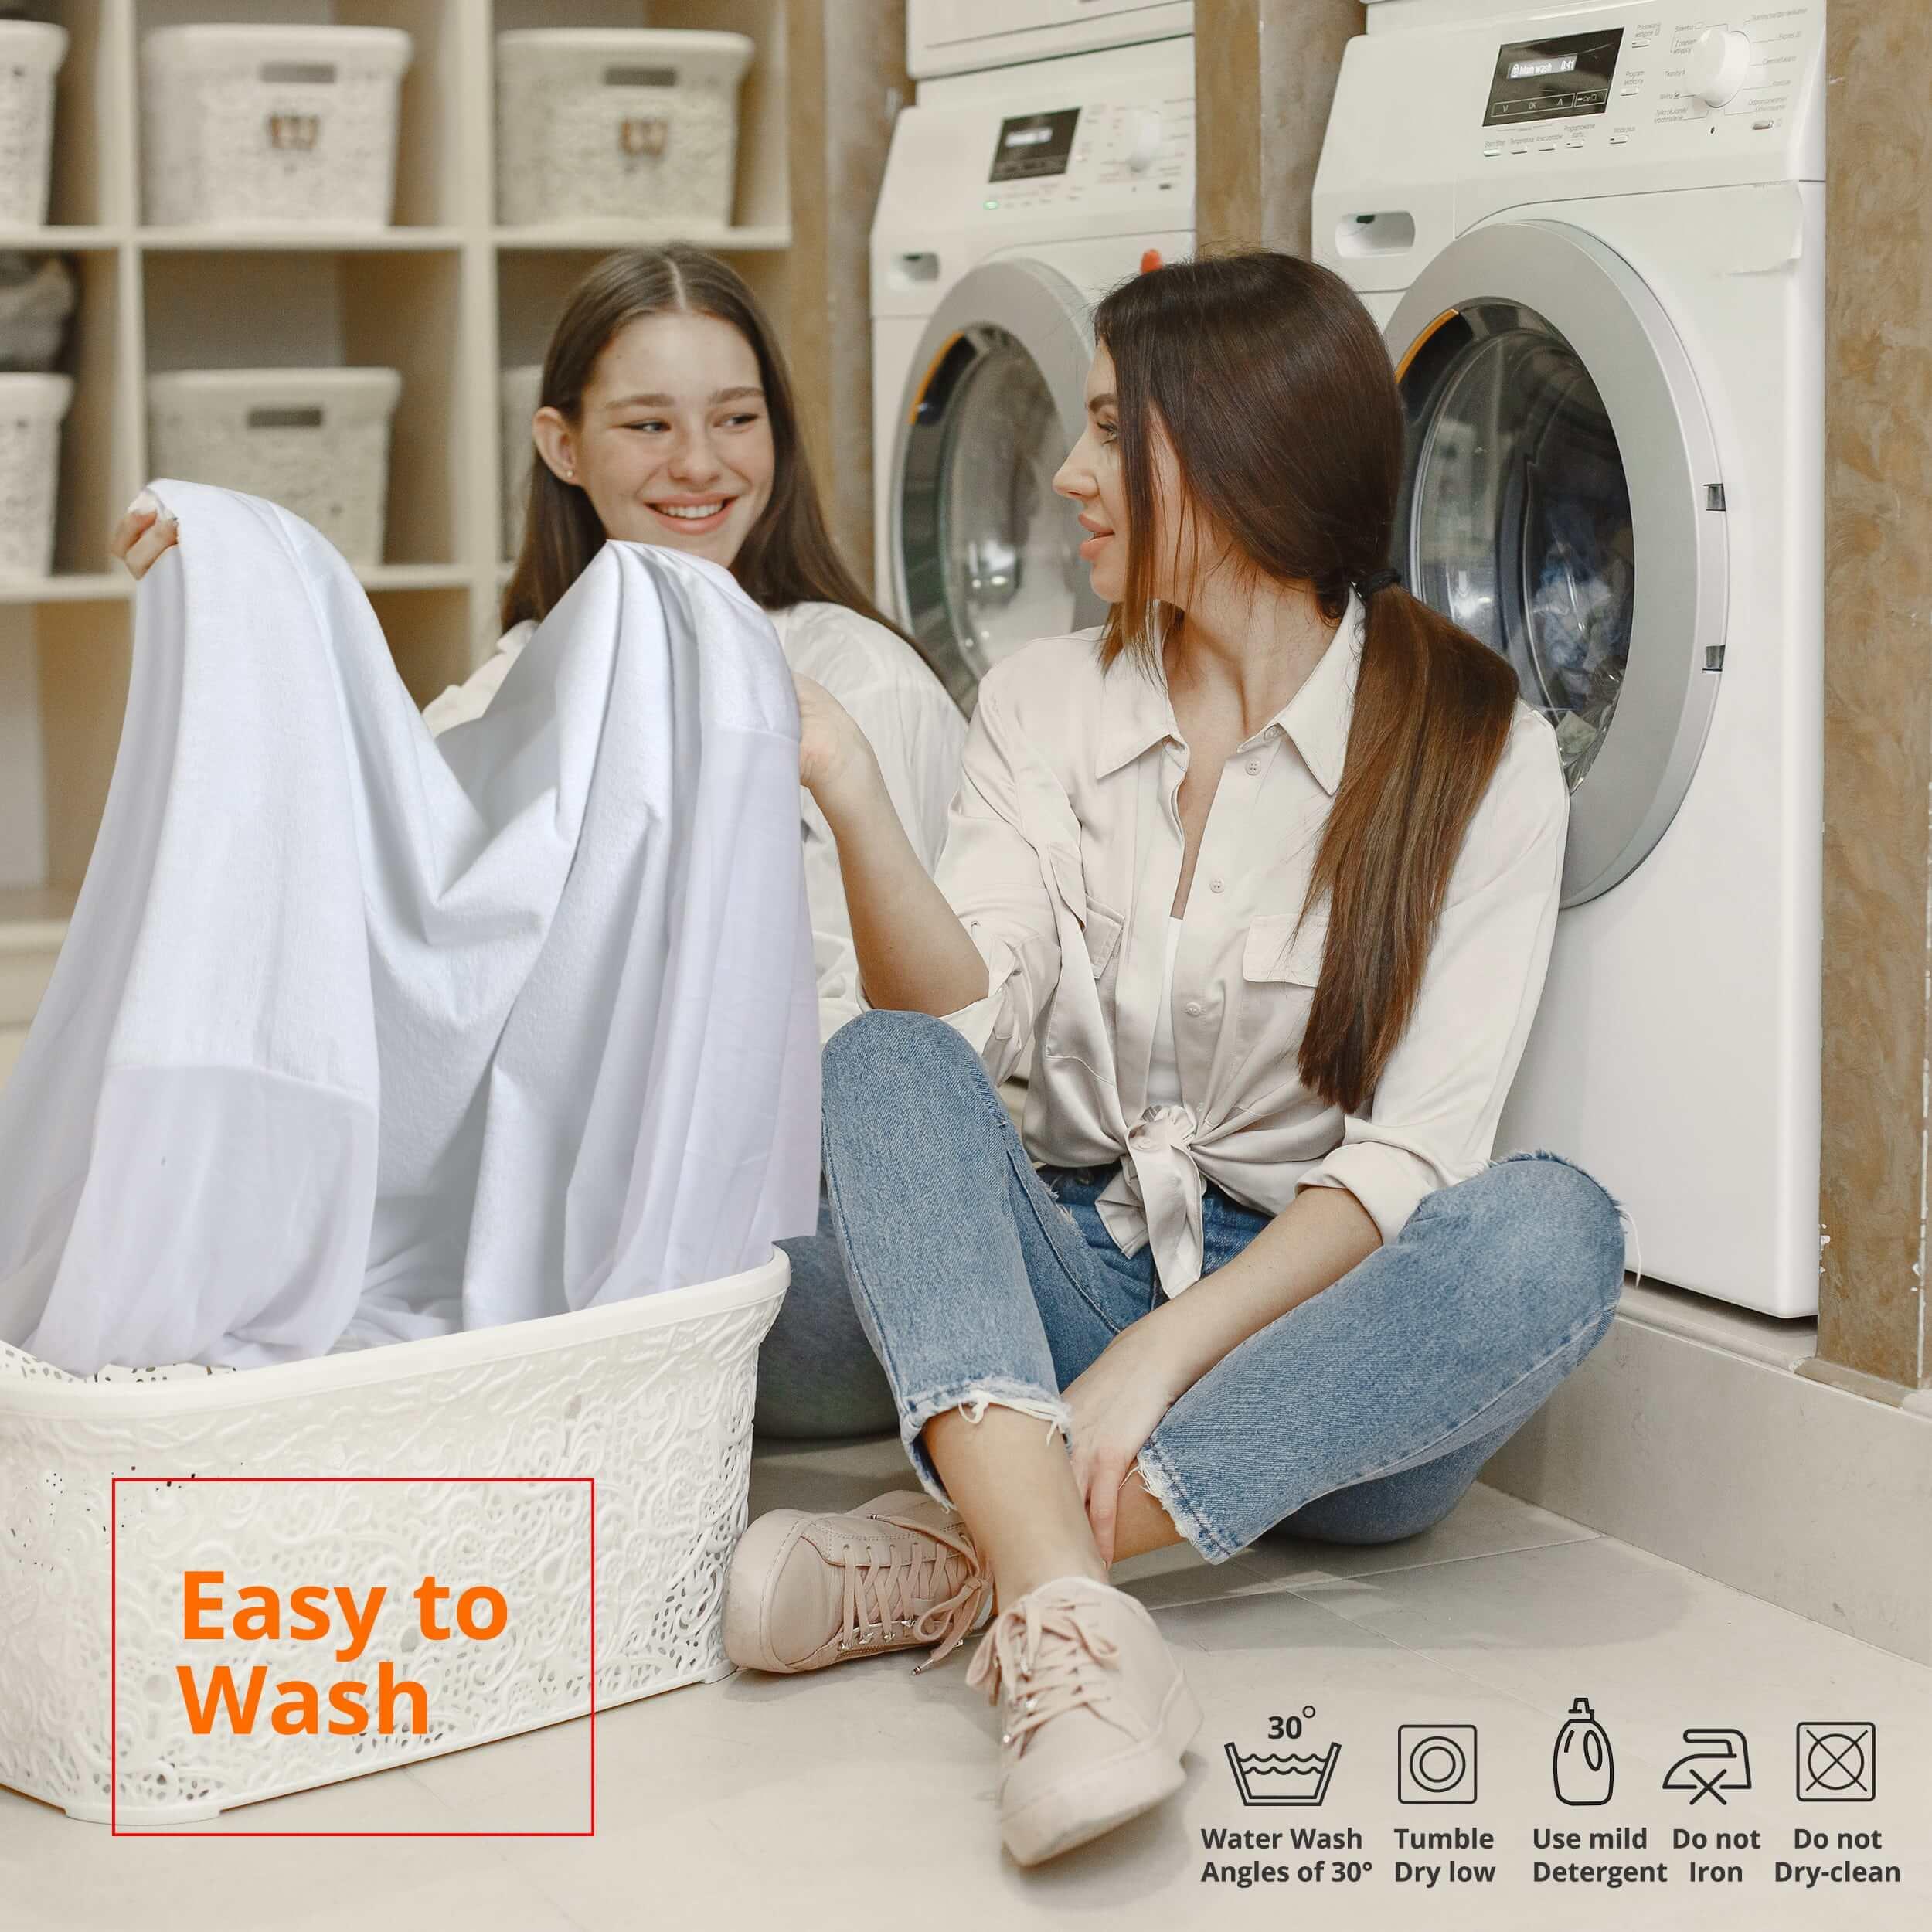 Mattress-Protector-Washing-min.jpg?time=1635056428